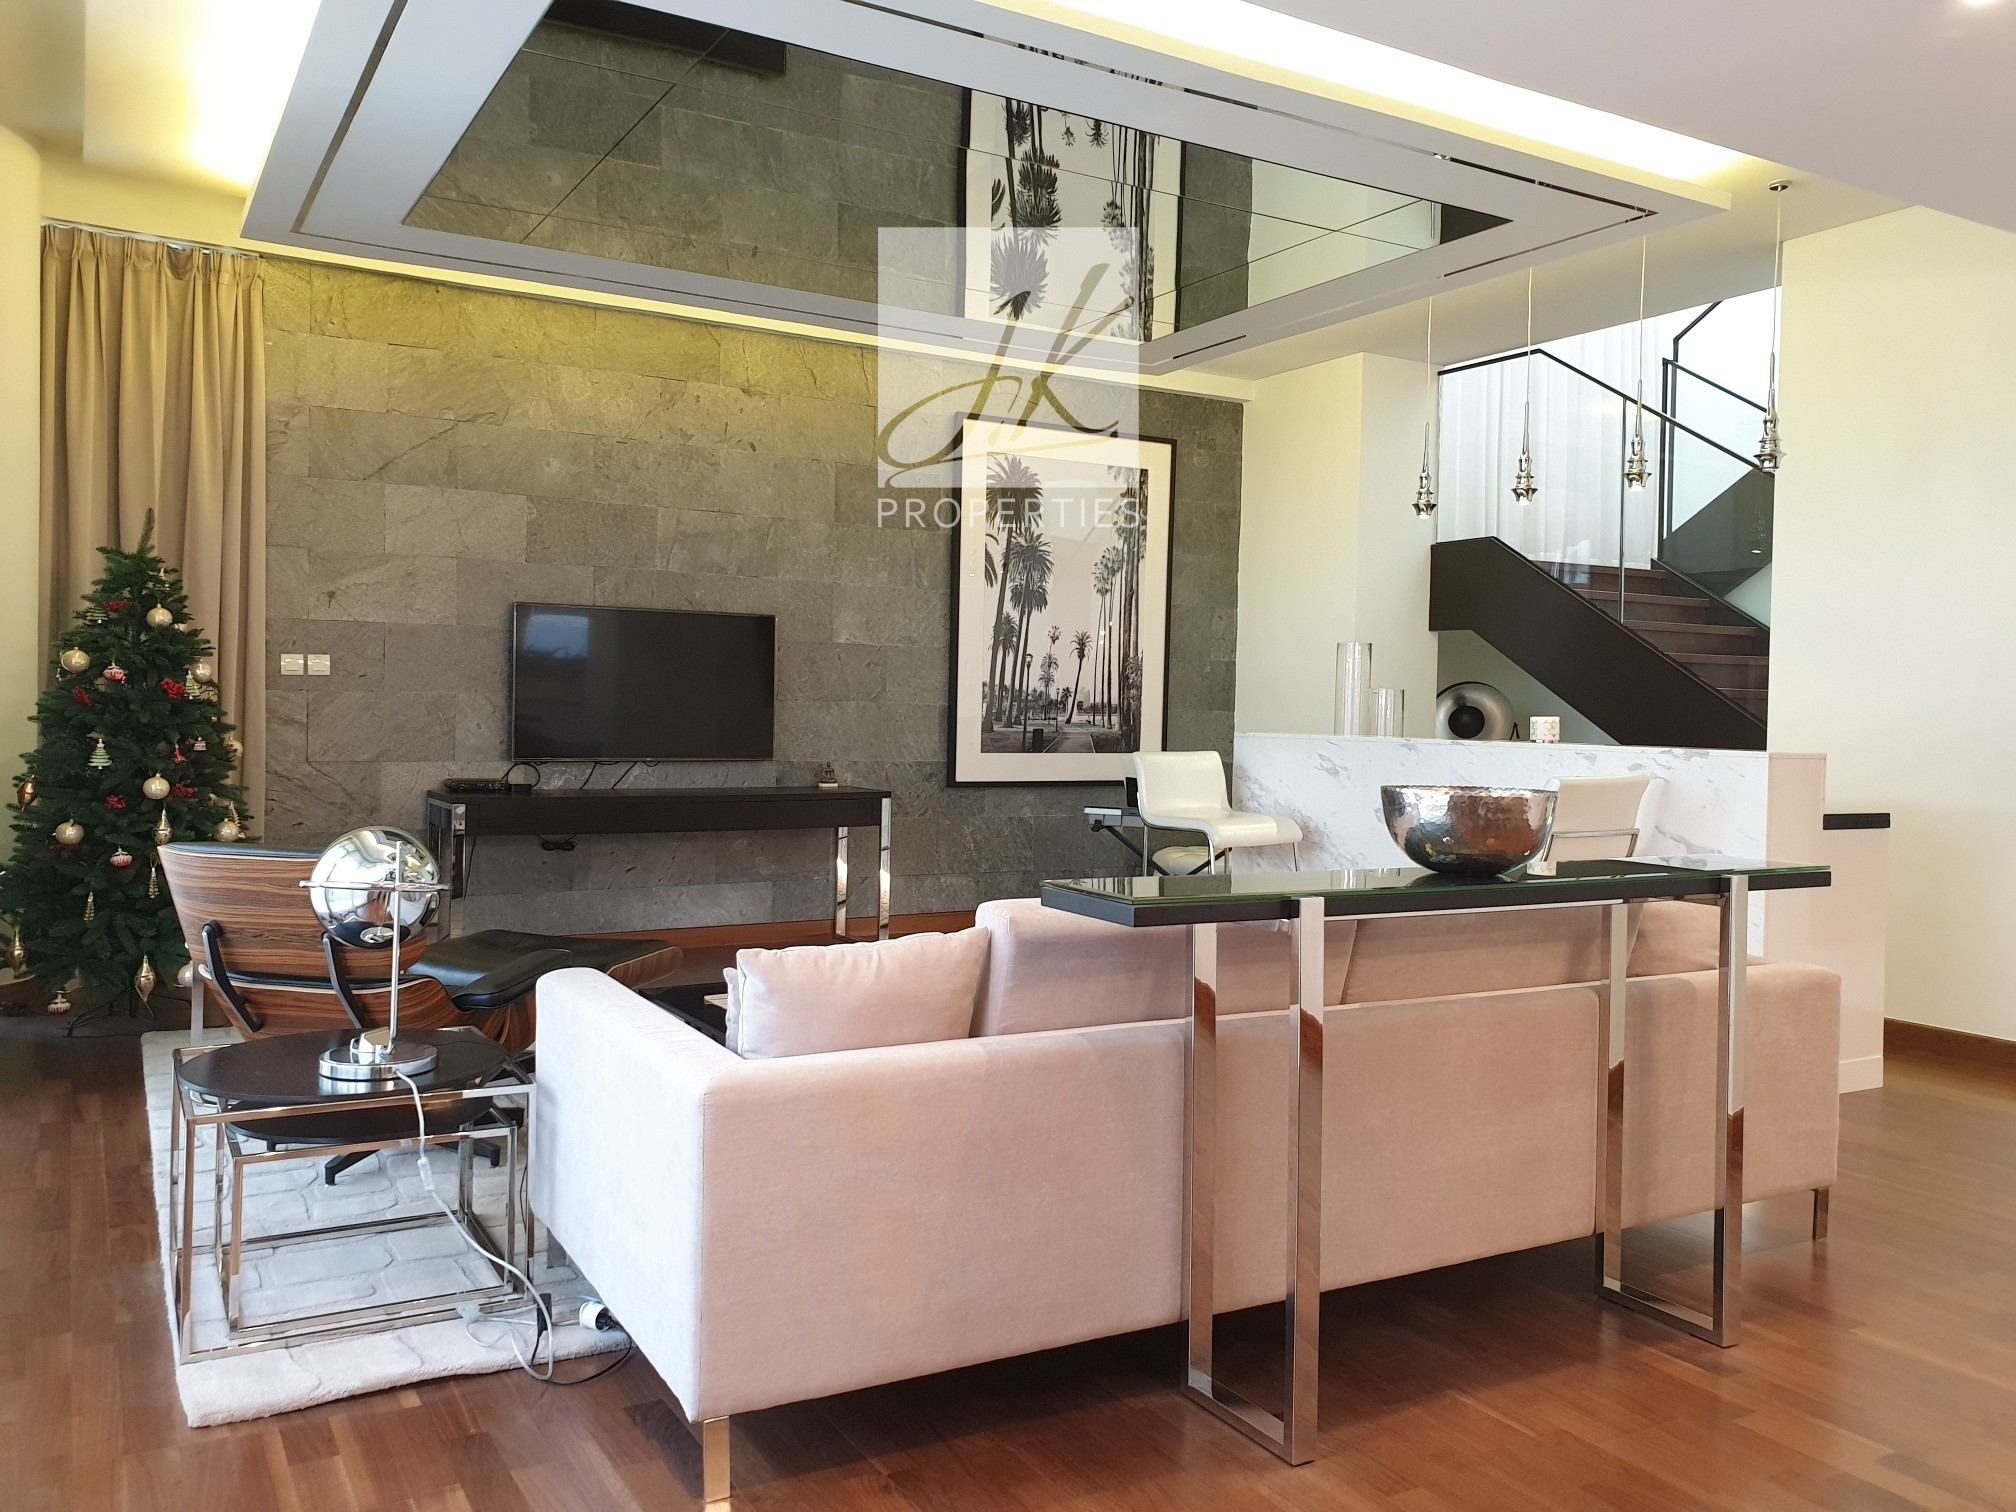 Hollywood Style|Luxury Furnished|Great Community